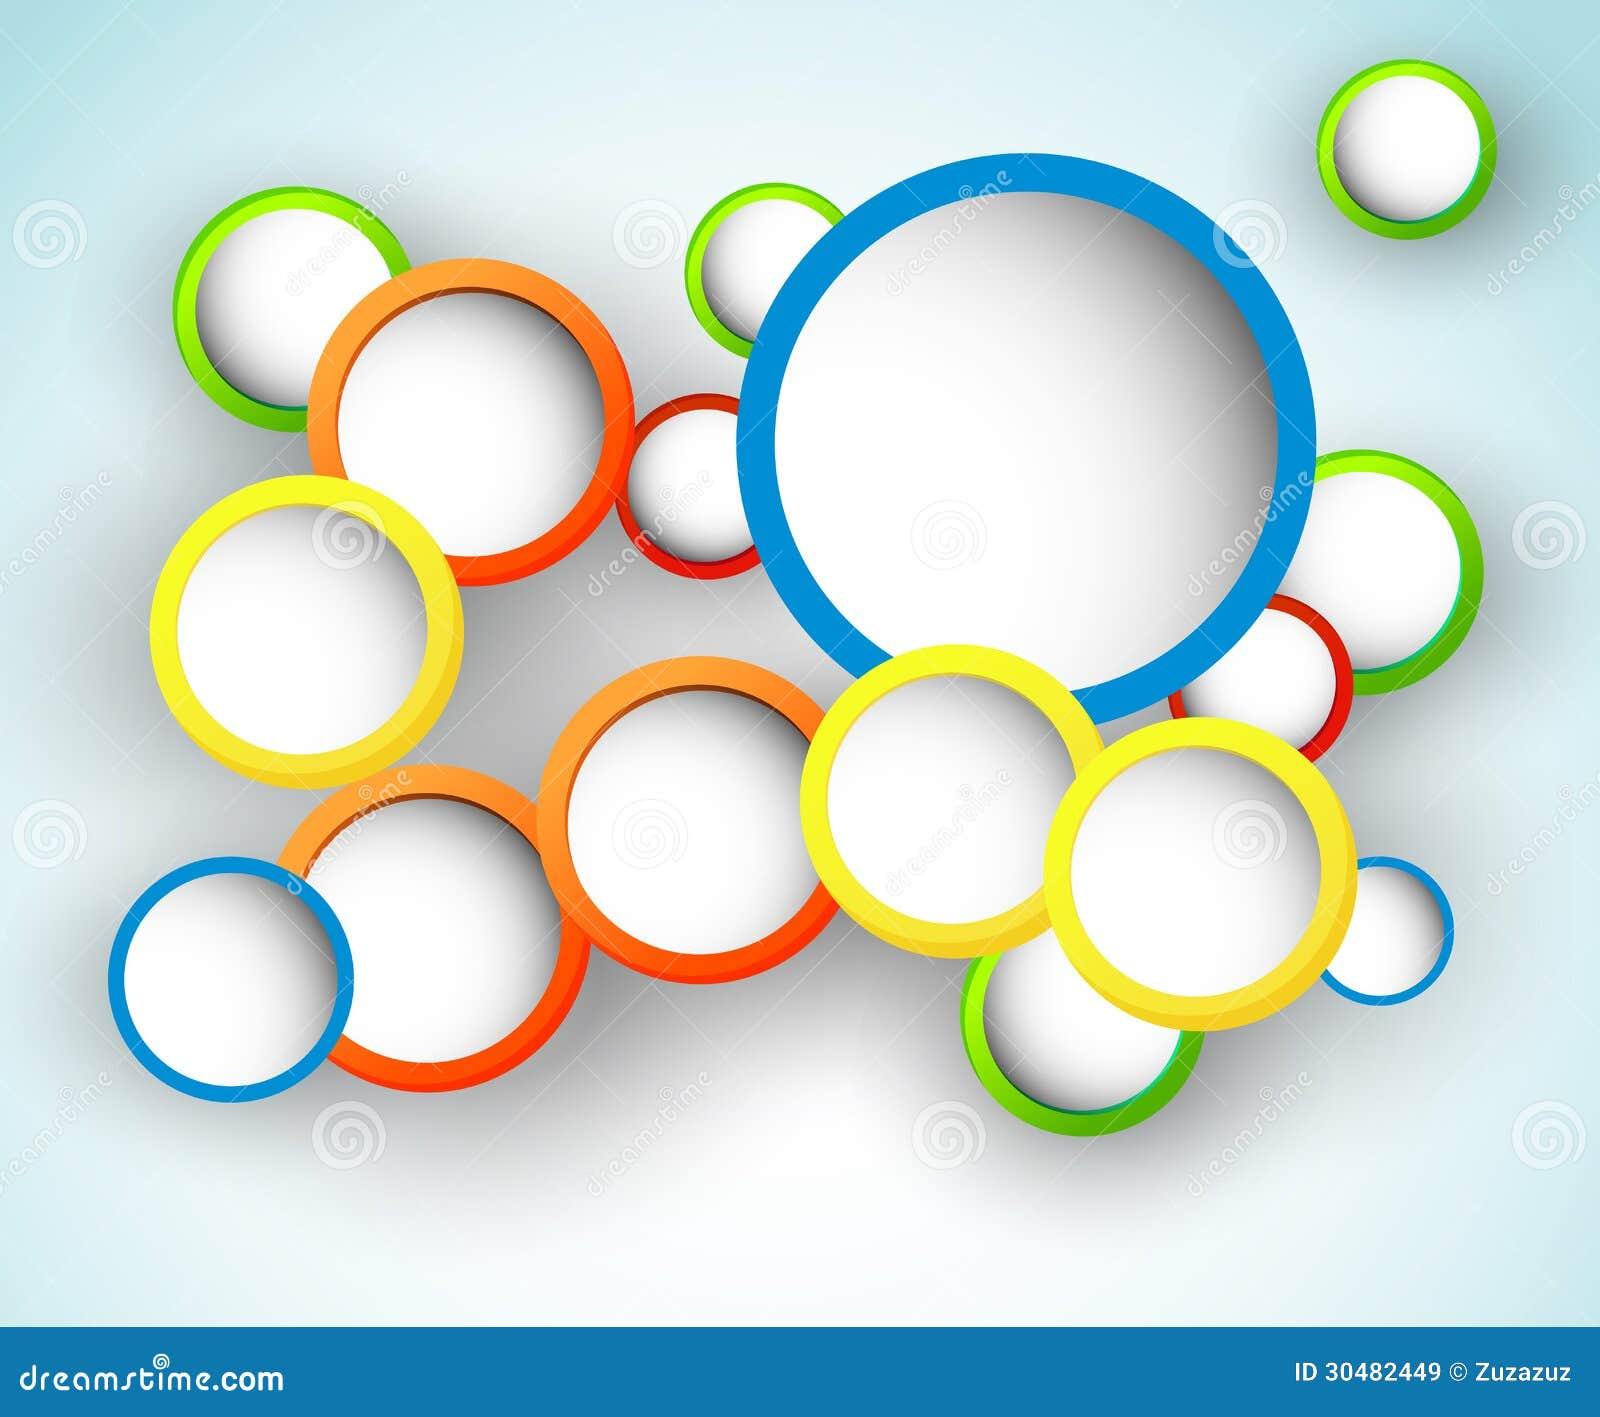 abstract design circle sector - photo #31